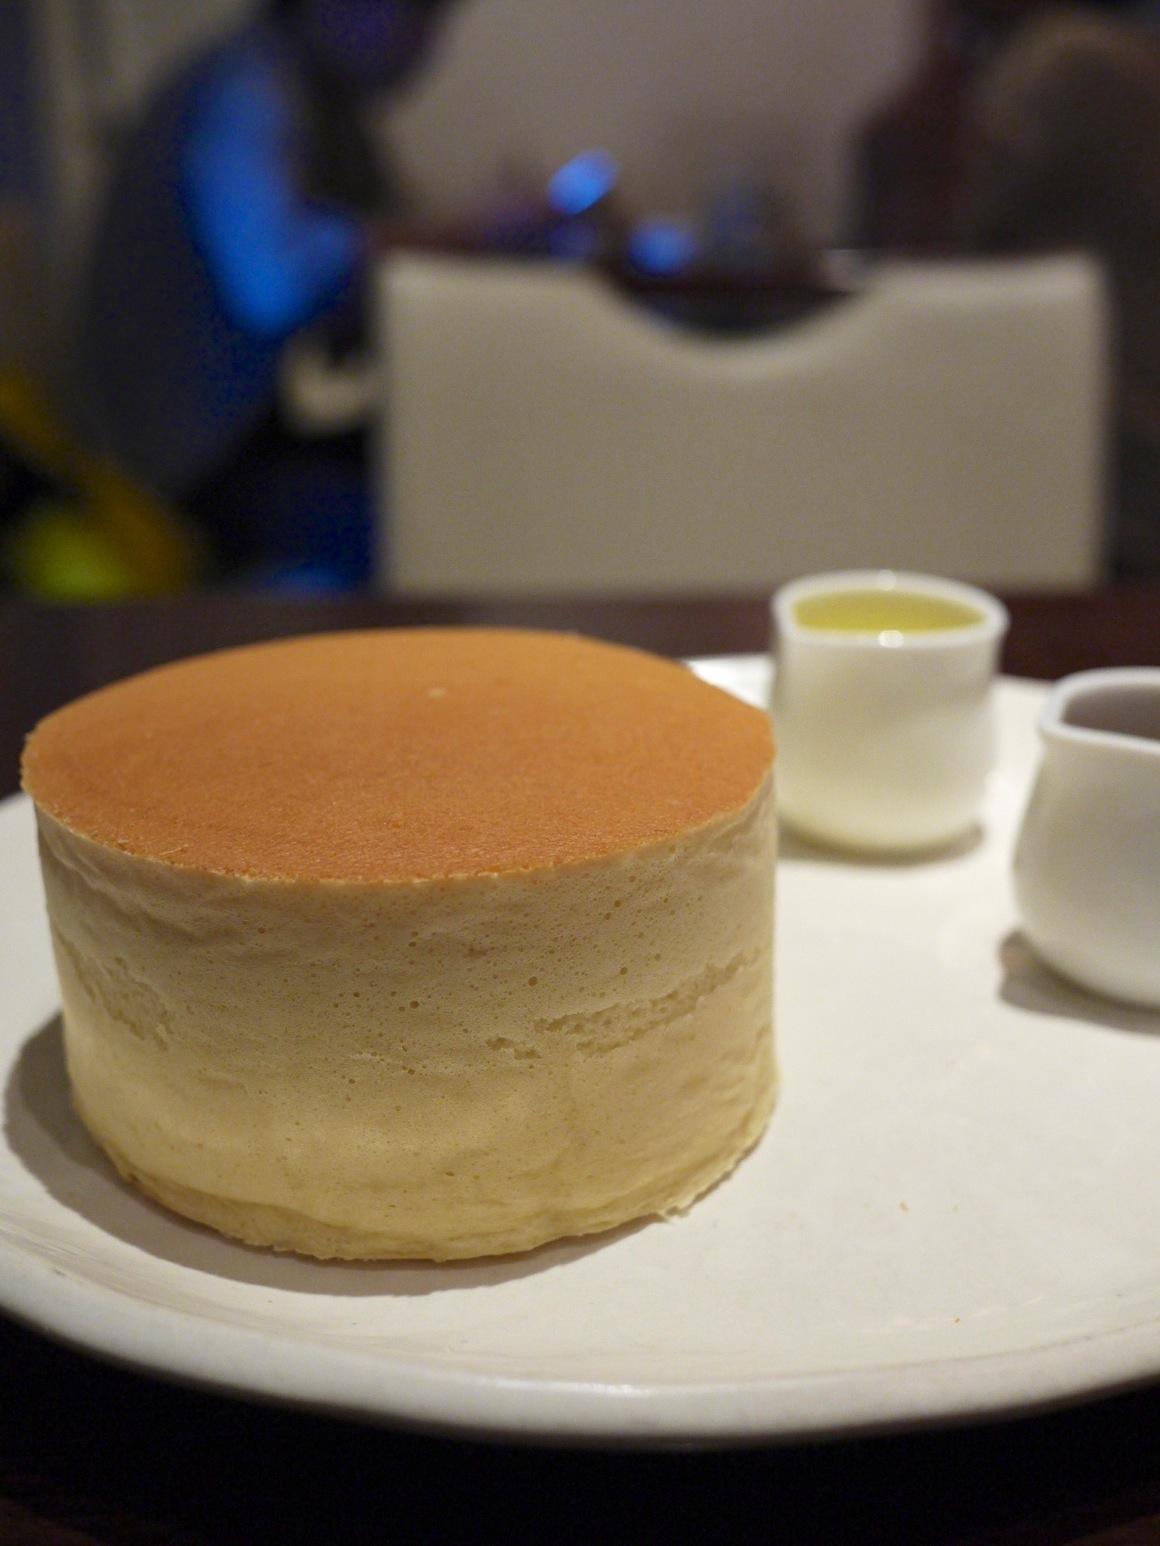 SONJINのパンケーキ